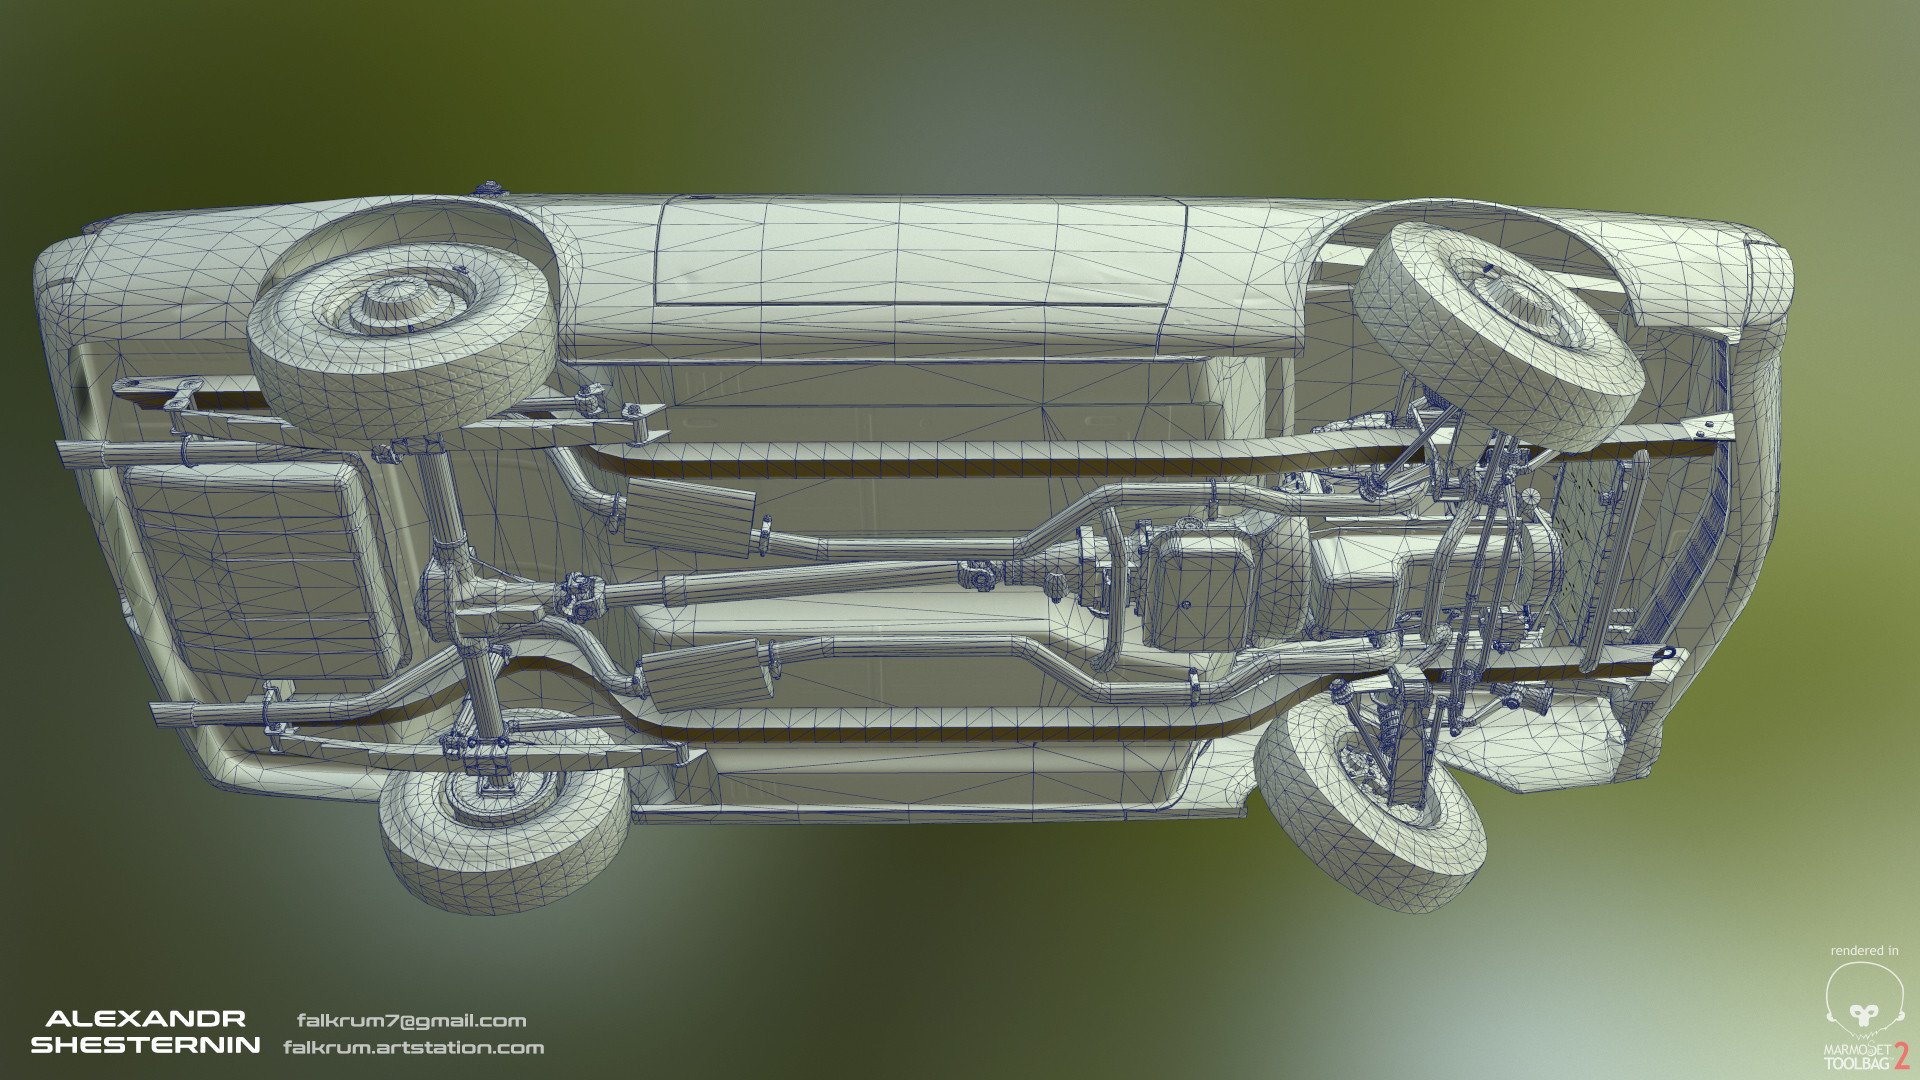 Alexandr shesternin modular abandoned car13